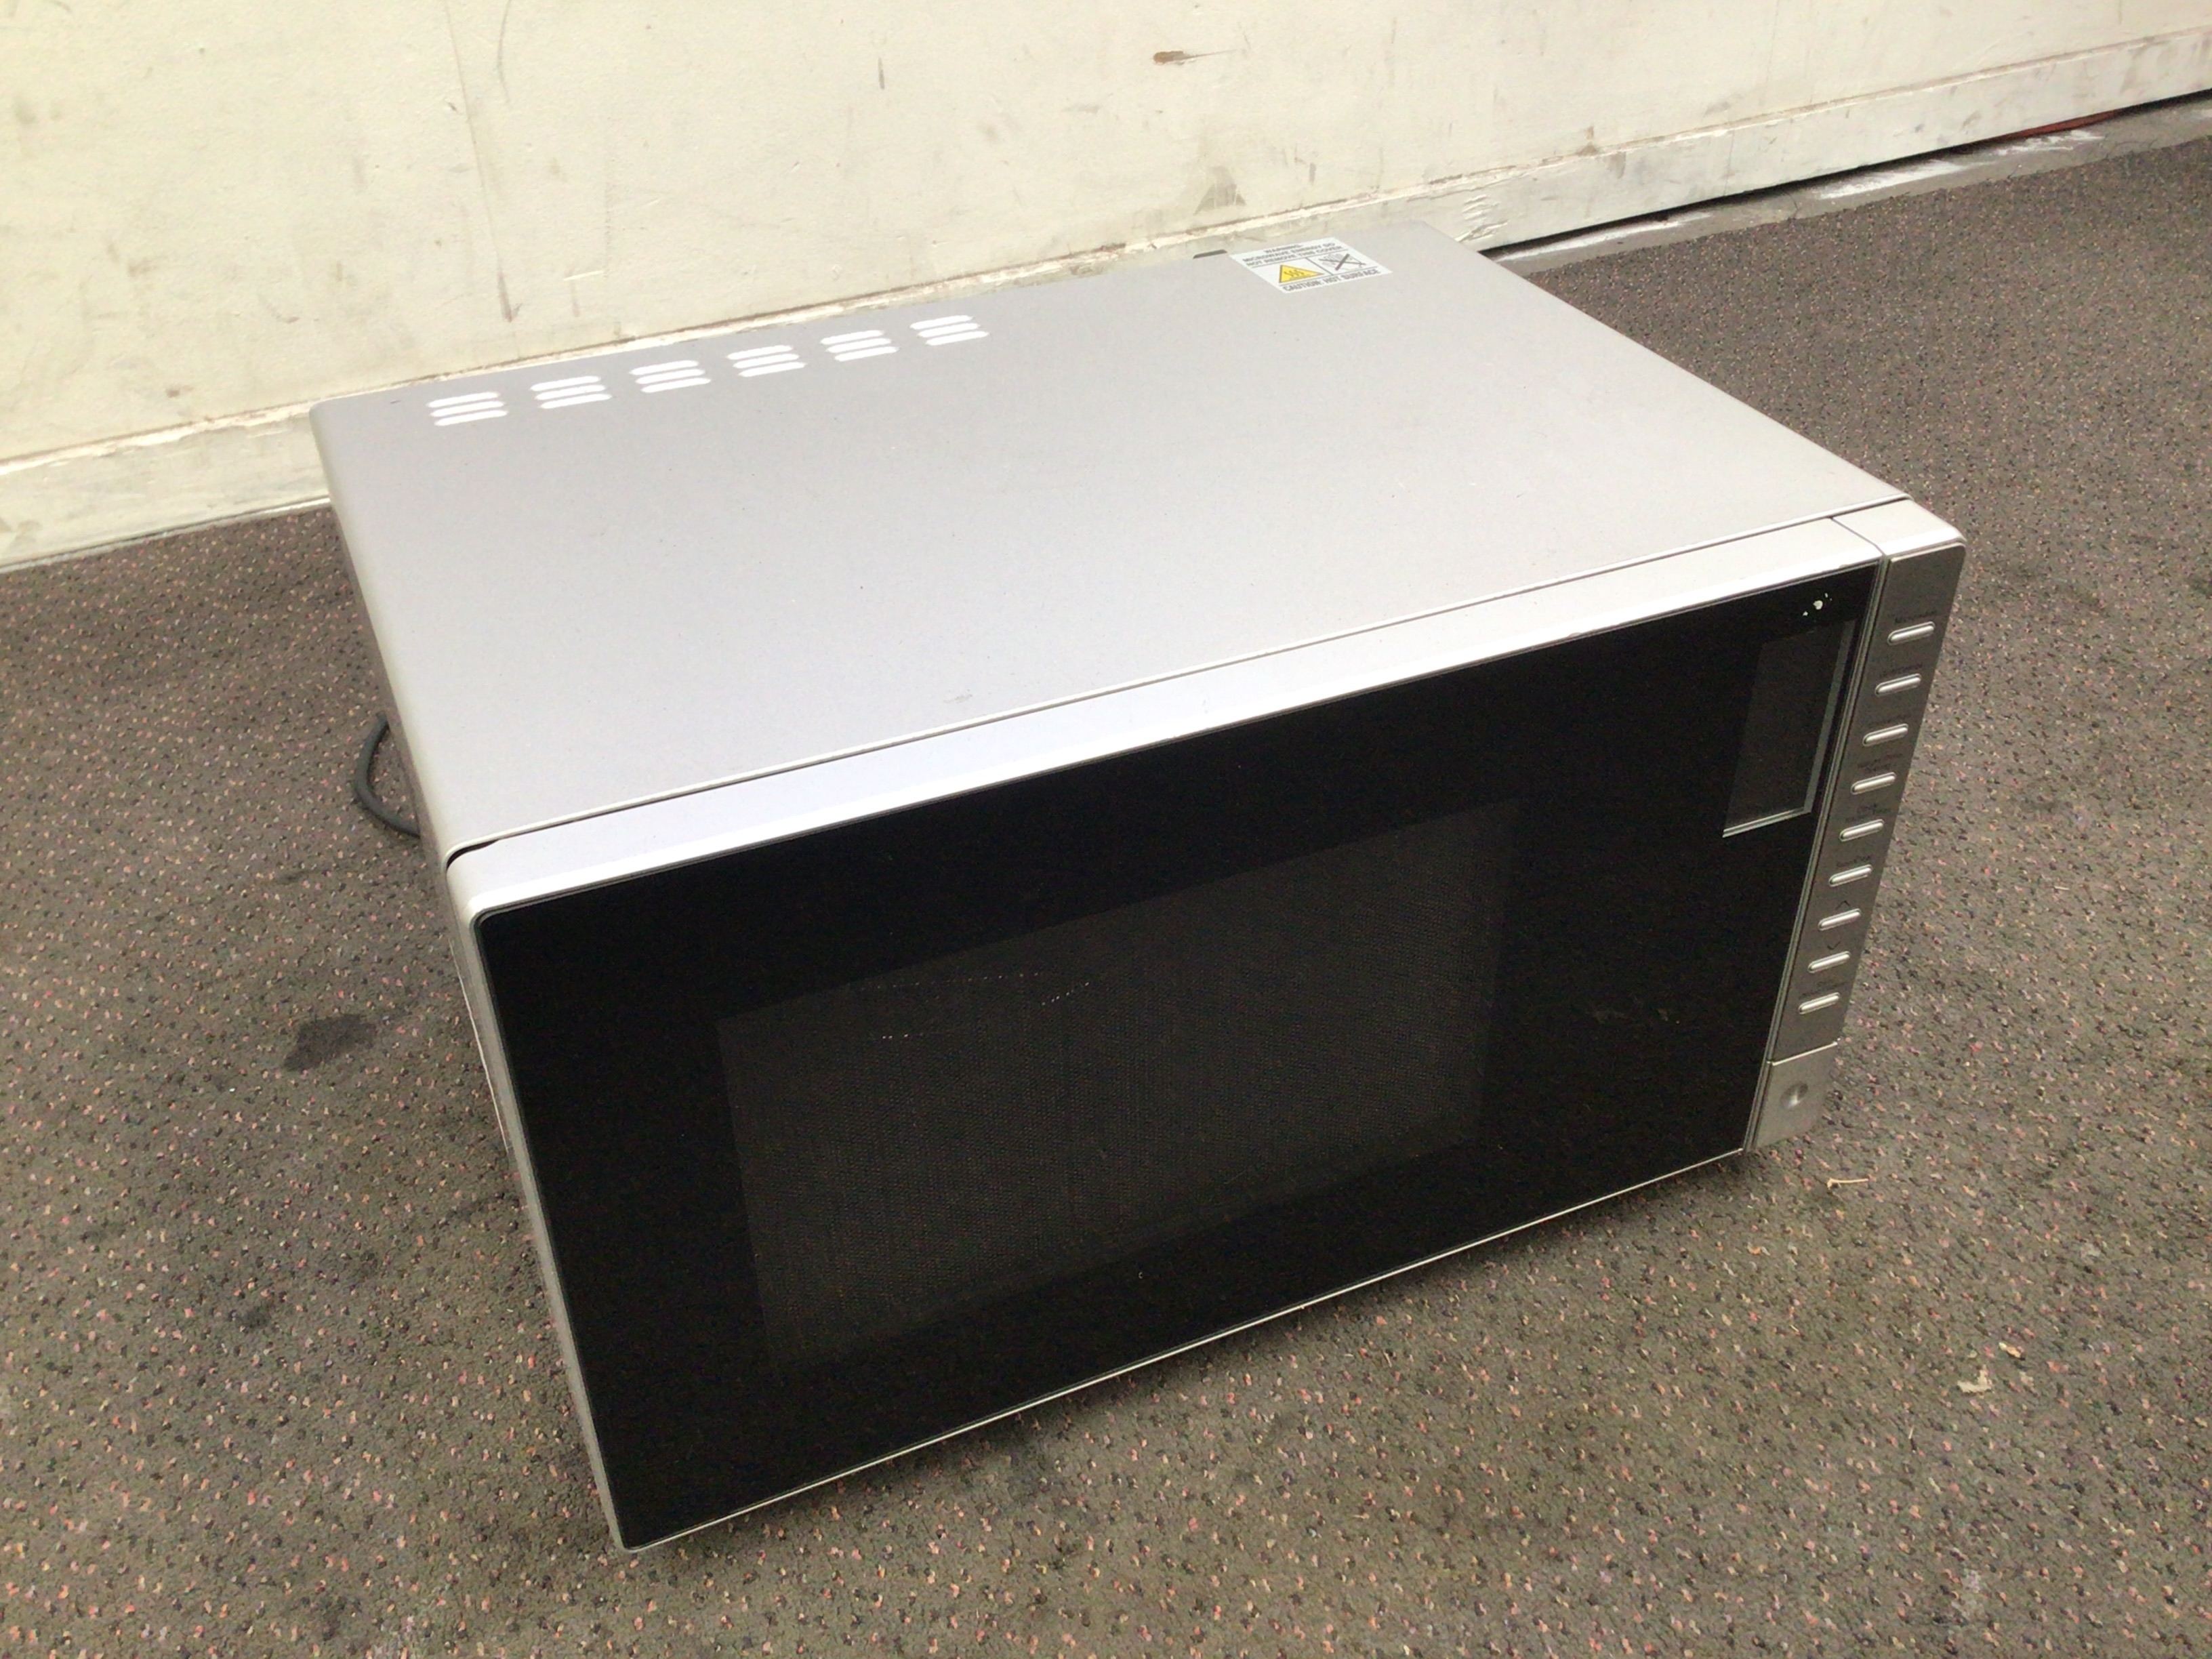 Home & Co AW925EXG Microwave